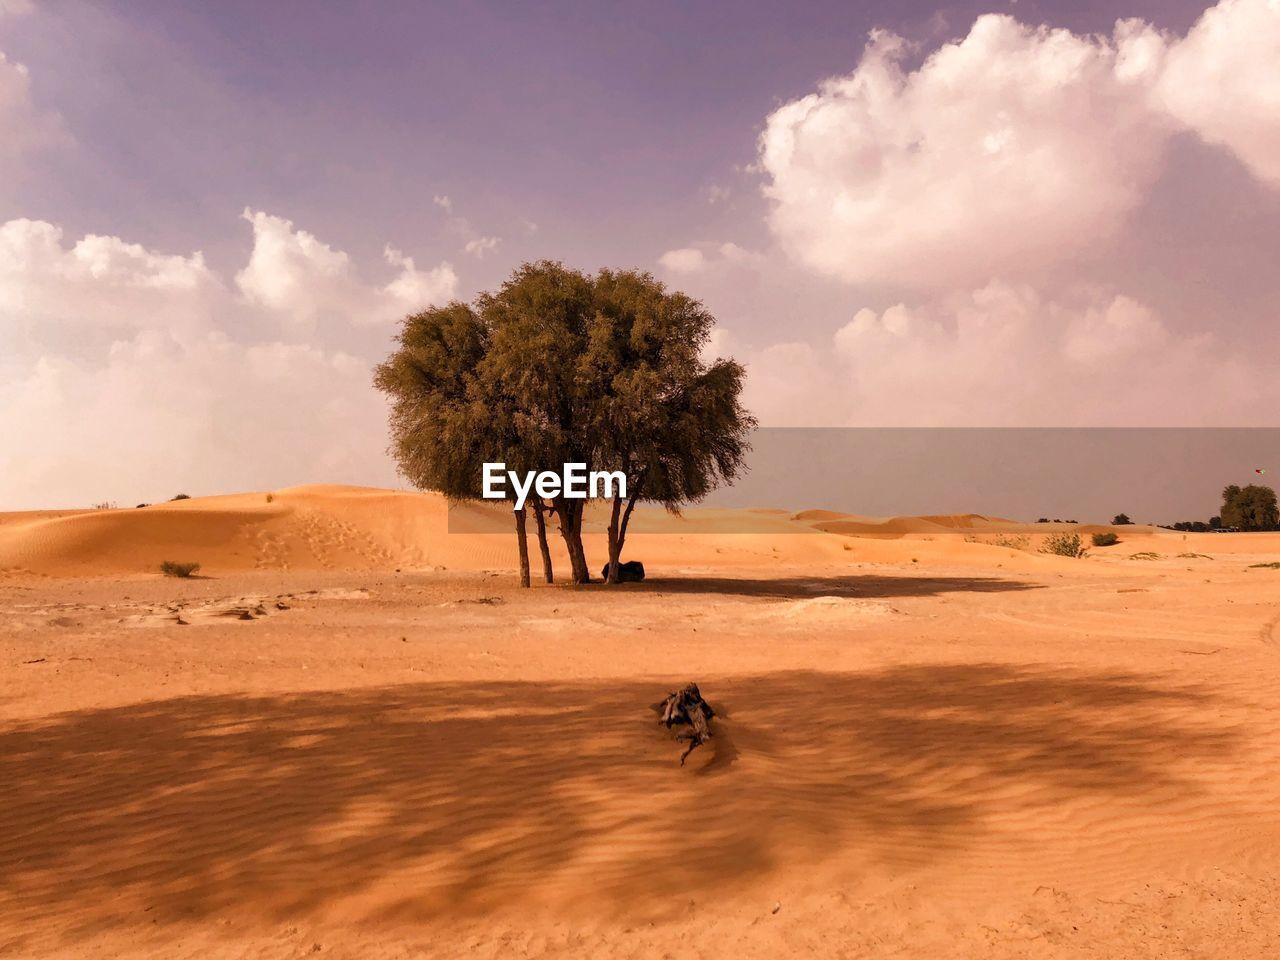 SCENIC VIEW OF TREE ON DESERT